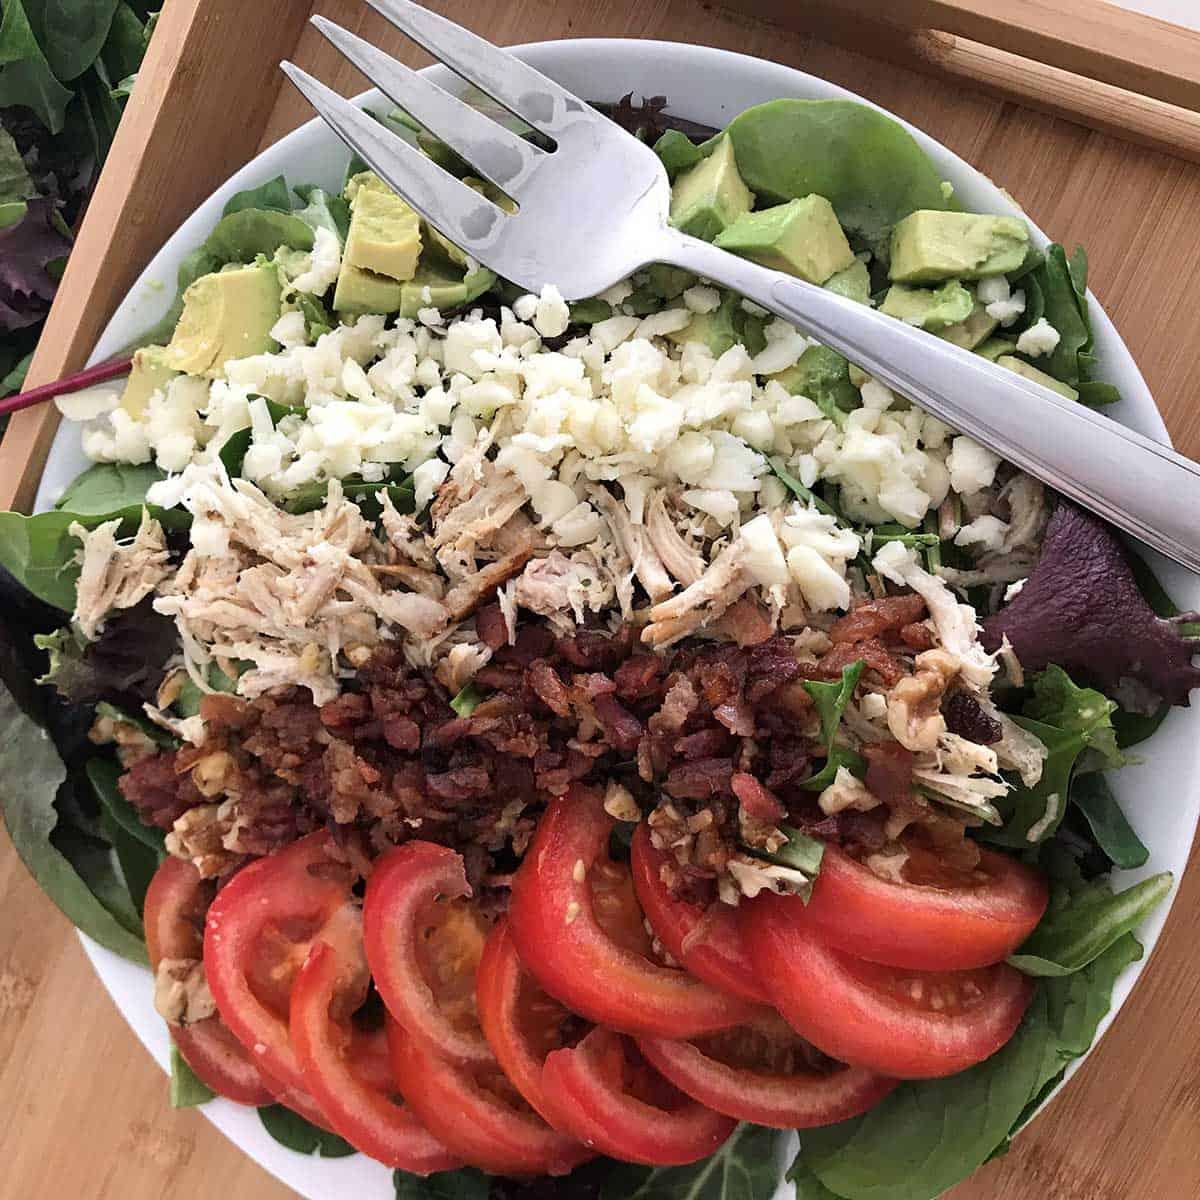 Keto Salad High Fat Low Carb Cobb Salad Diabetes Strong